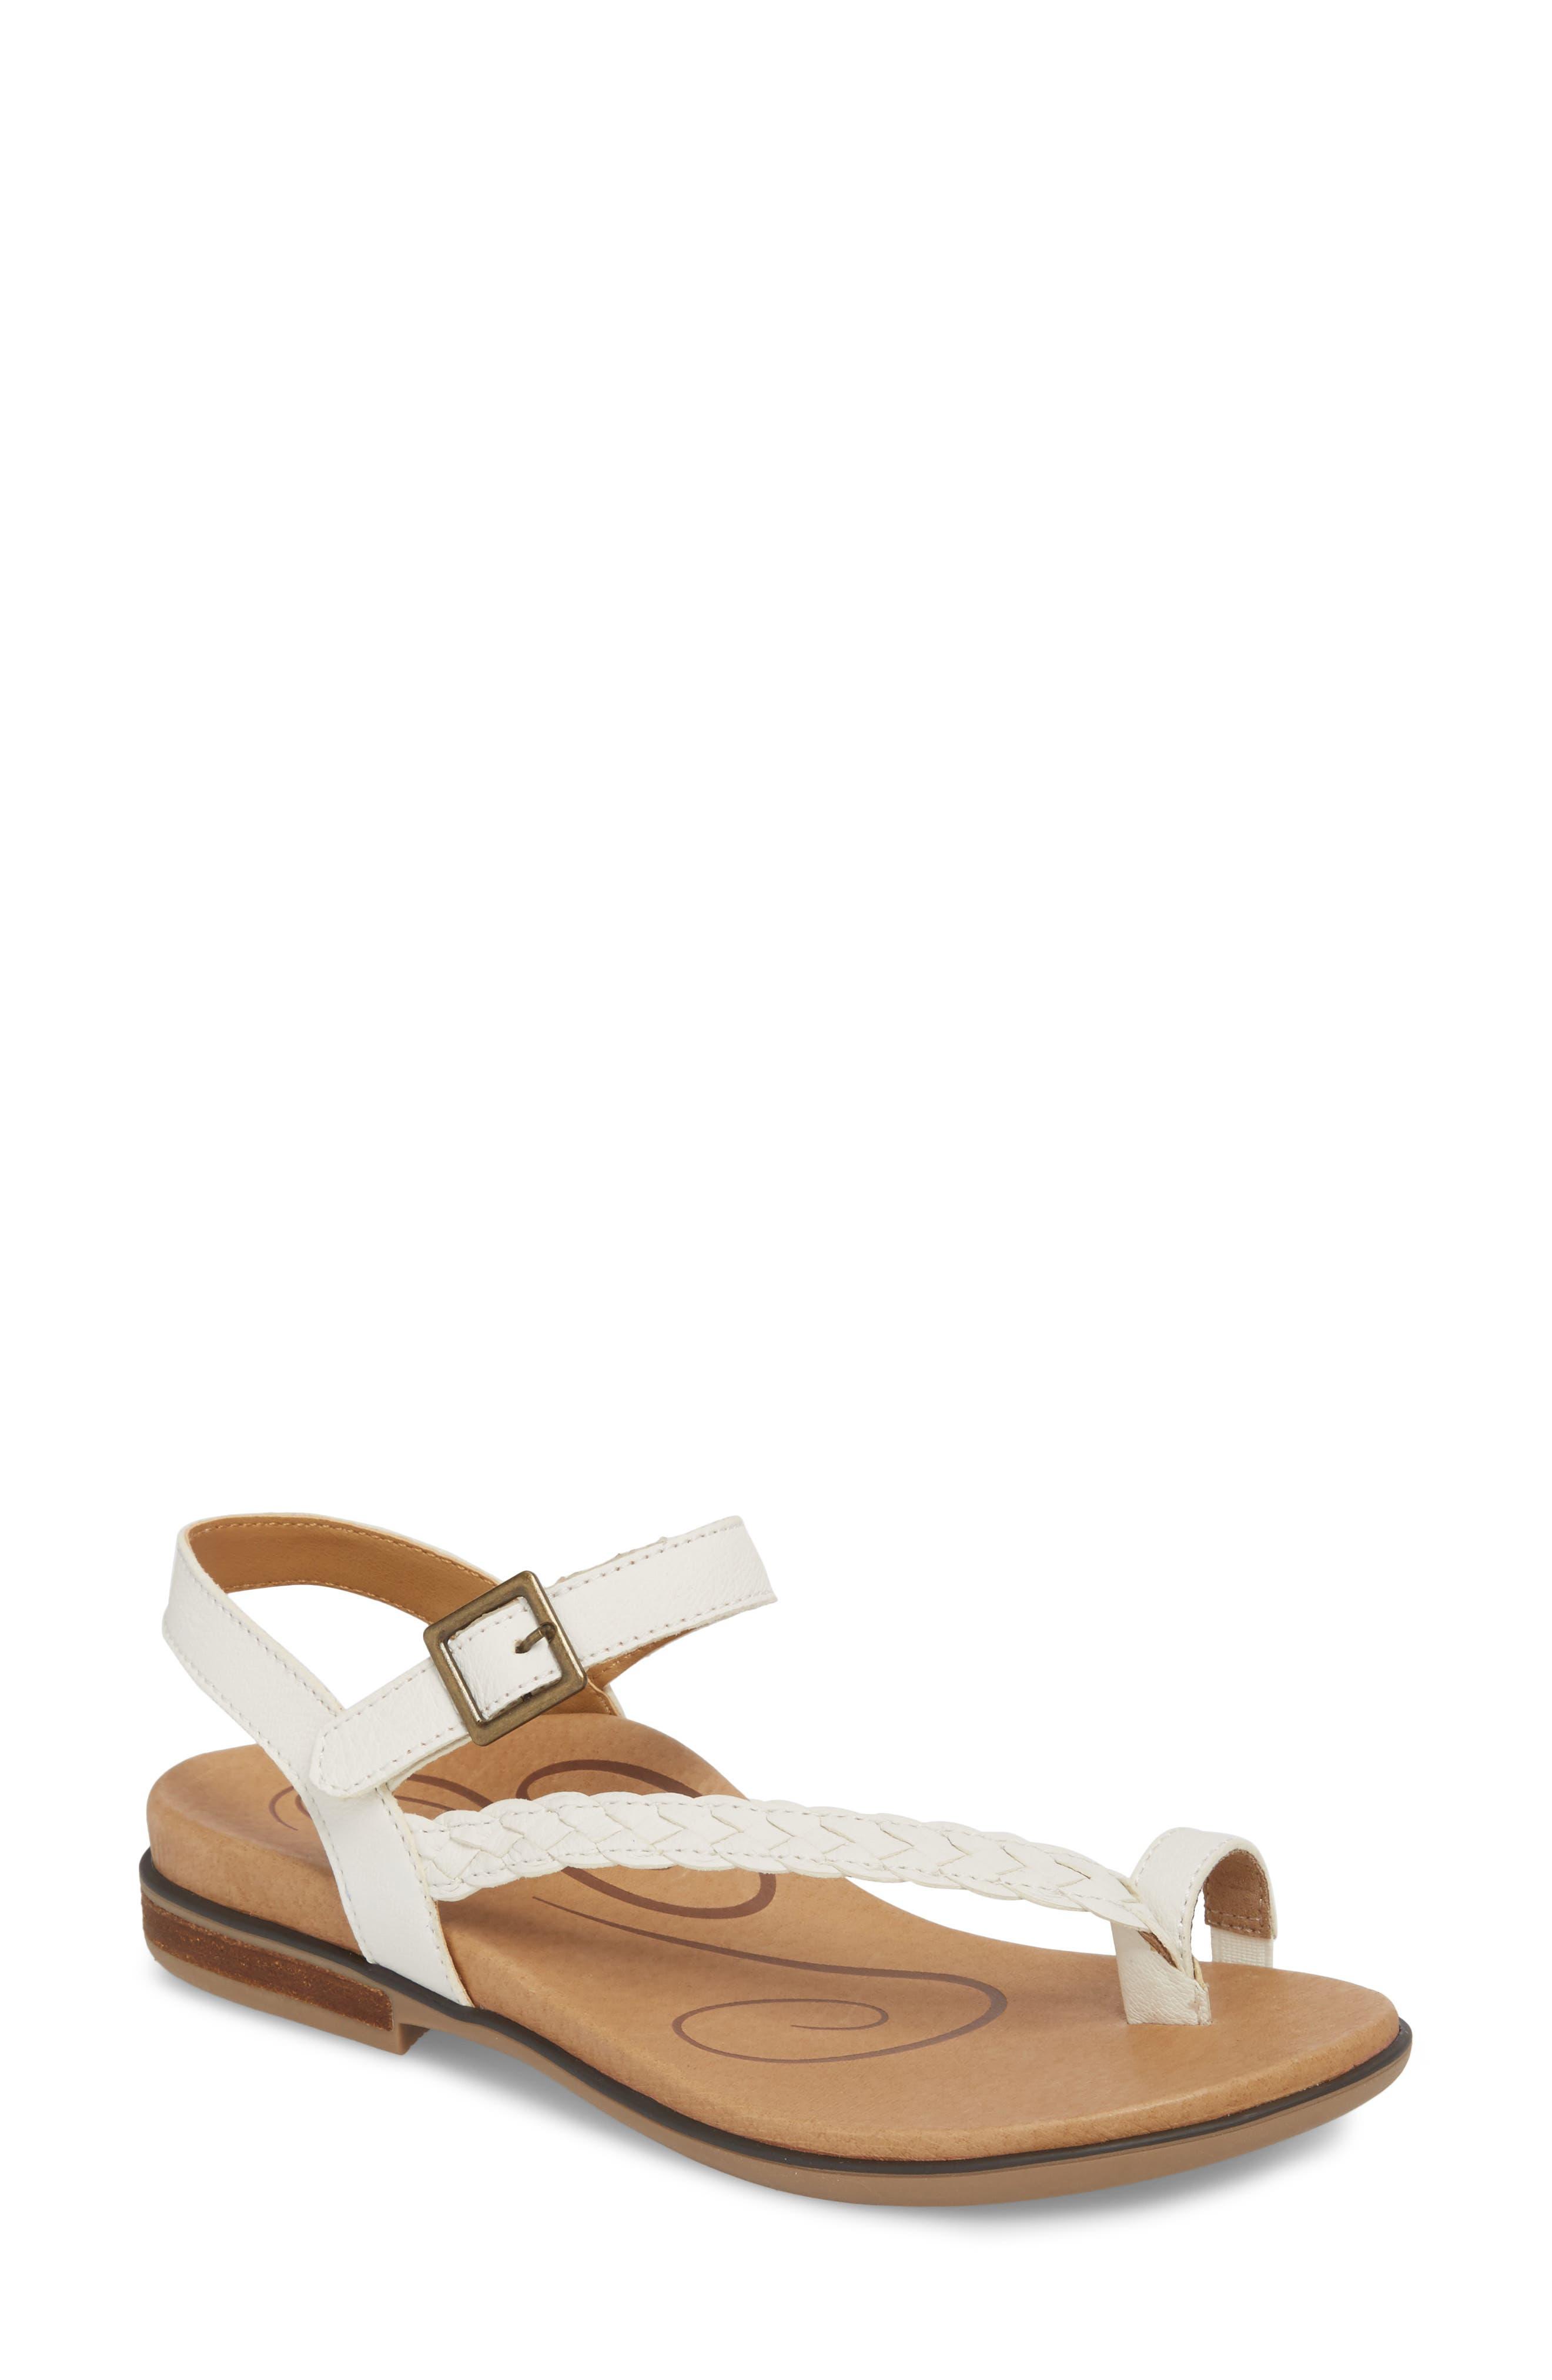 Evie Braided Strap Sandal